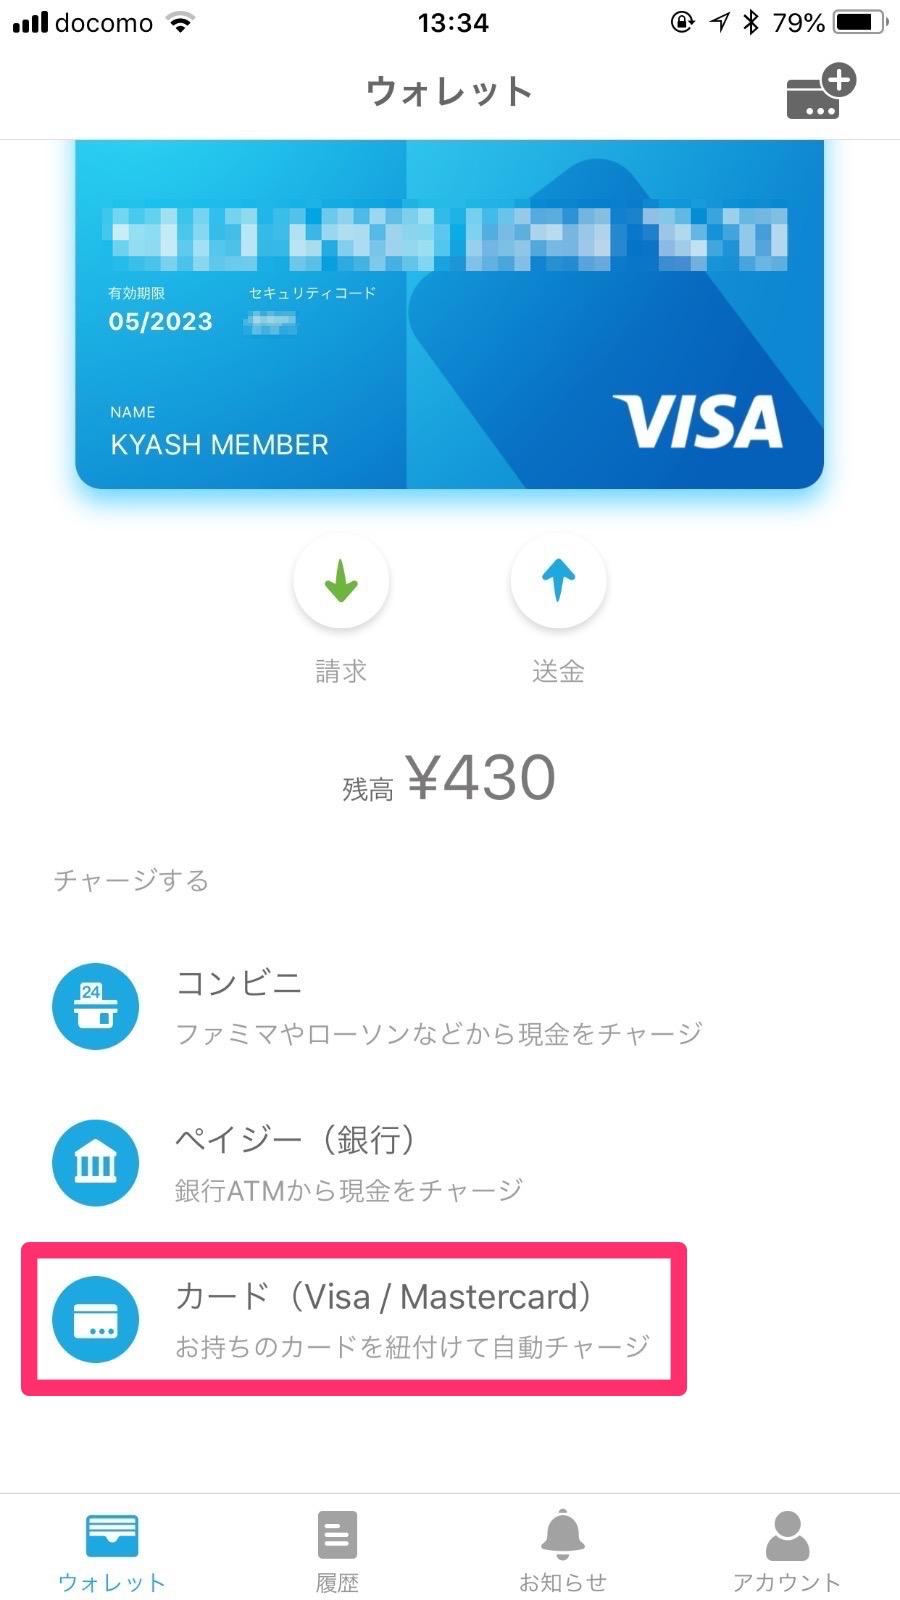 「Kyash」チャージ用クレジットカードを登録 02